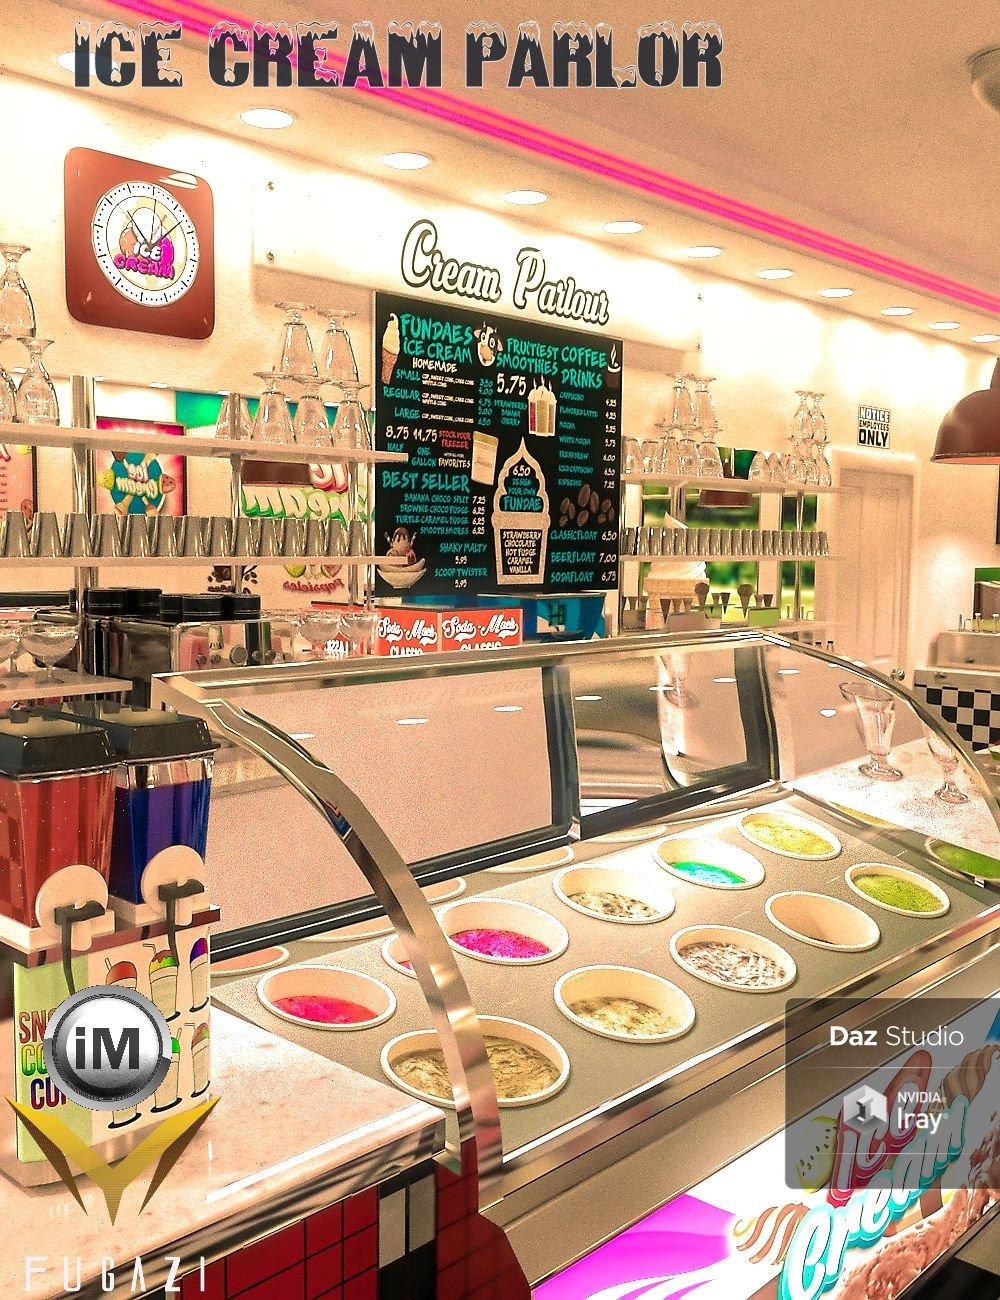 FG Ice Cream Parlor by: Fugazi1968Ironman, 3D Models by Daz 3D